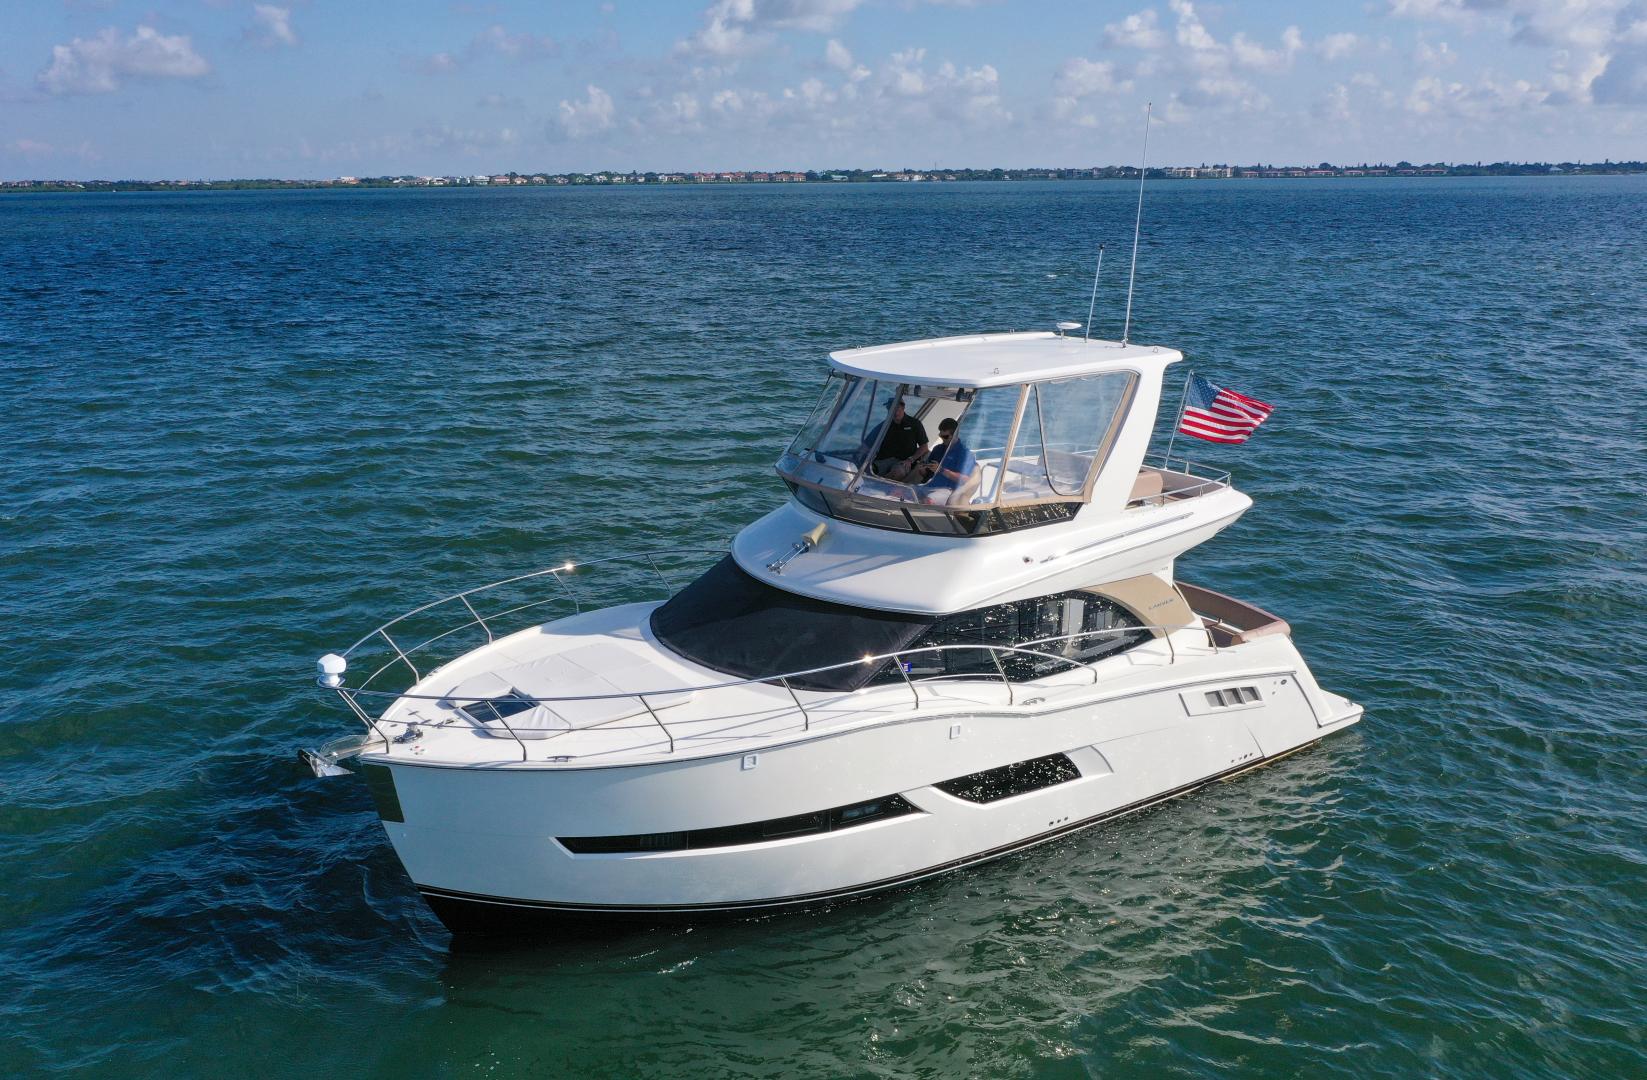 Carver-C40 2016-Ms. Behavin Longboat Key-Florida-United States-2016 40 Carver C Motor Yacht  Ms. Behavin  Profile-1515686   Thumbnail